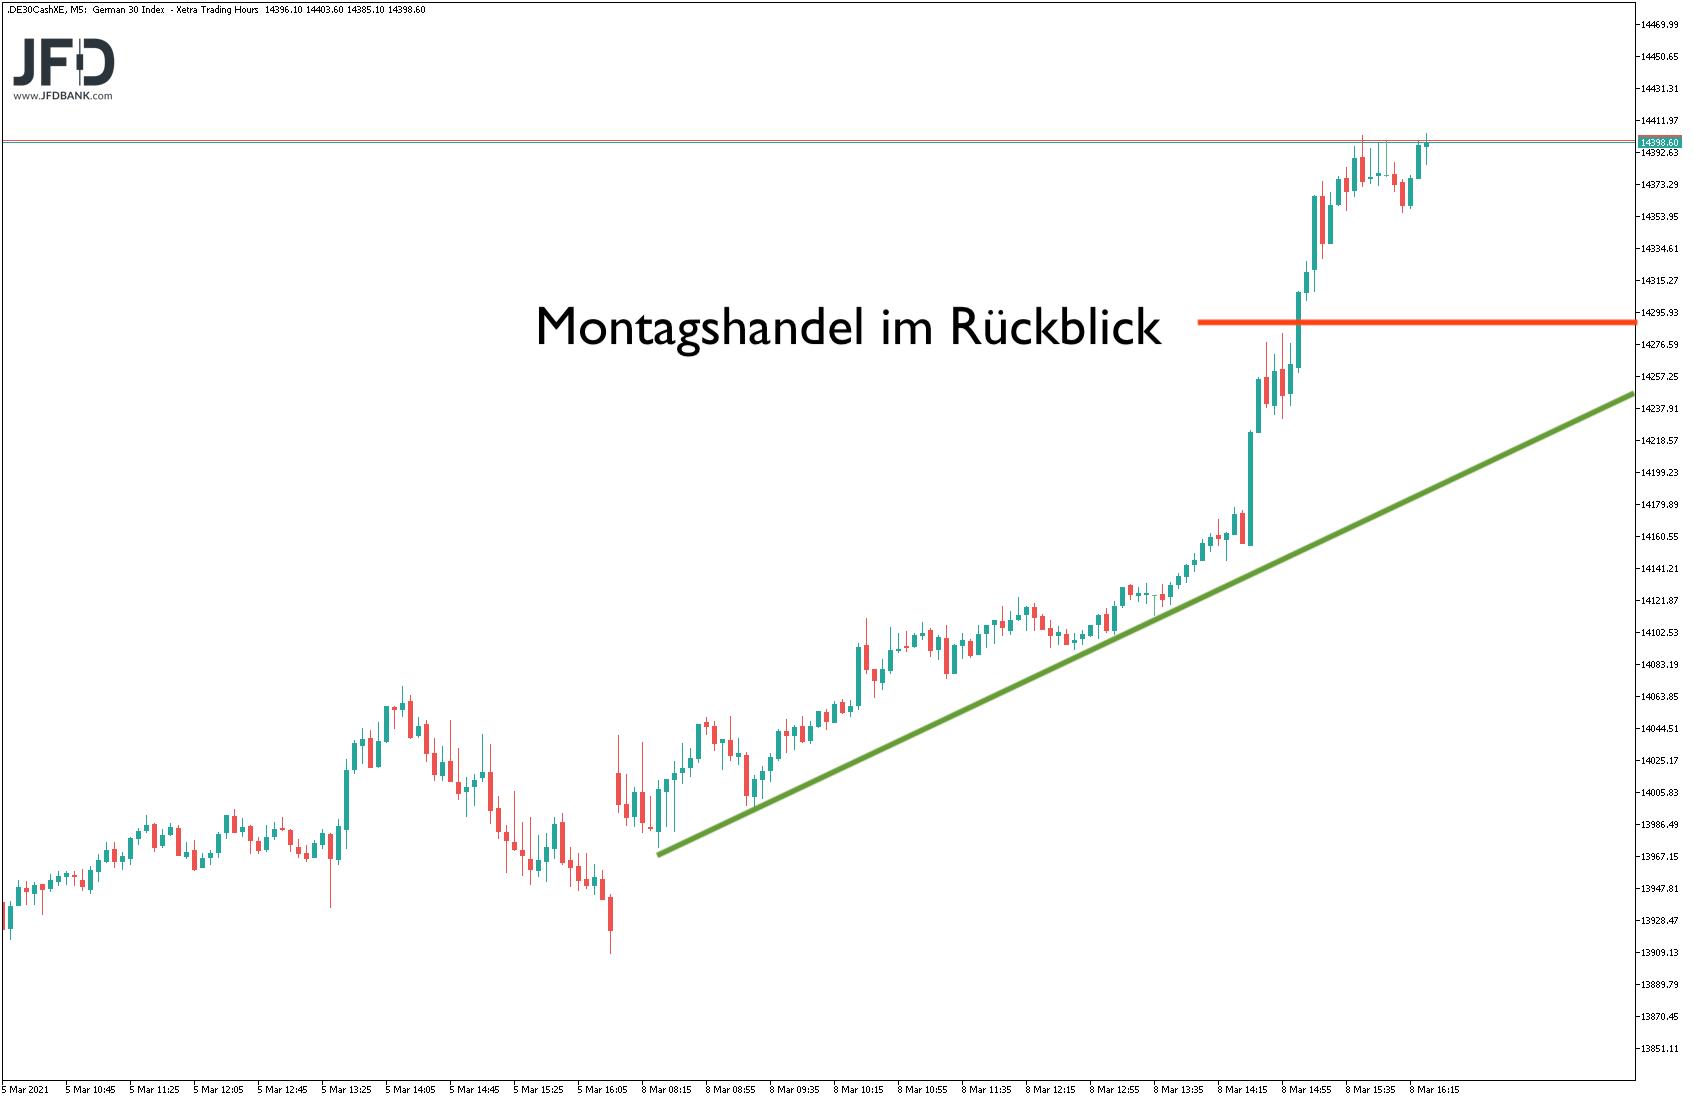 DAX-Rekordhoch-erzielt-halten-wir-das-Niveau-Kommentar-JFD-Bank-GodmodeTrader.de-2